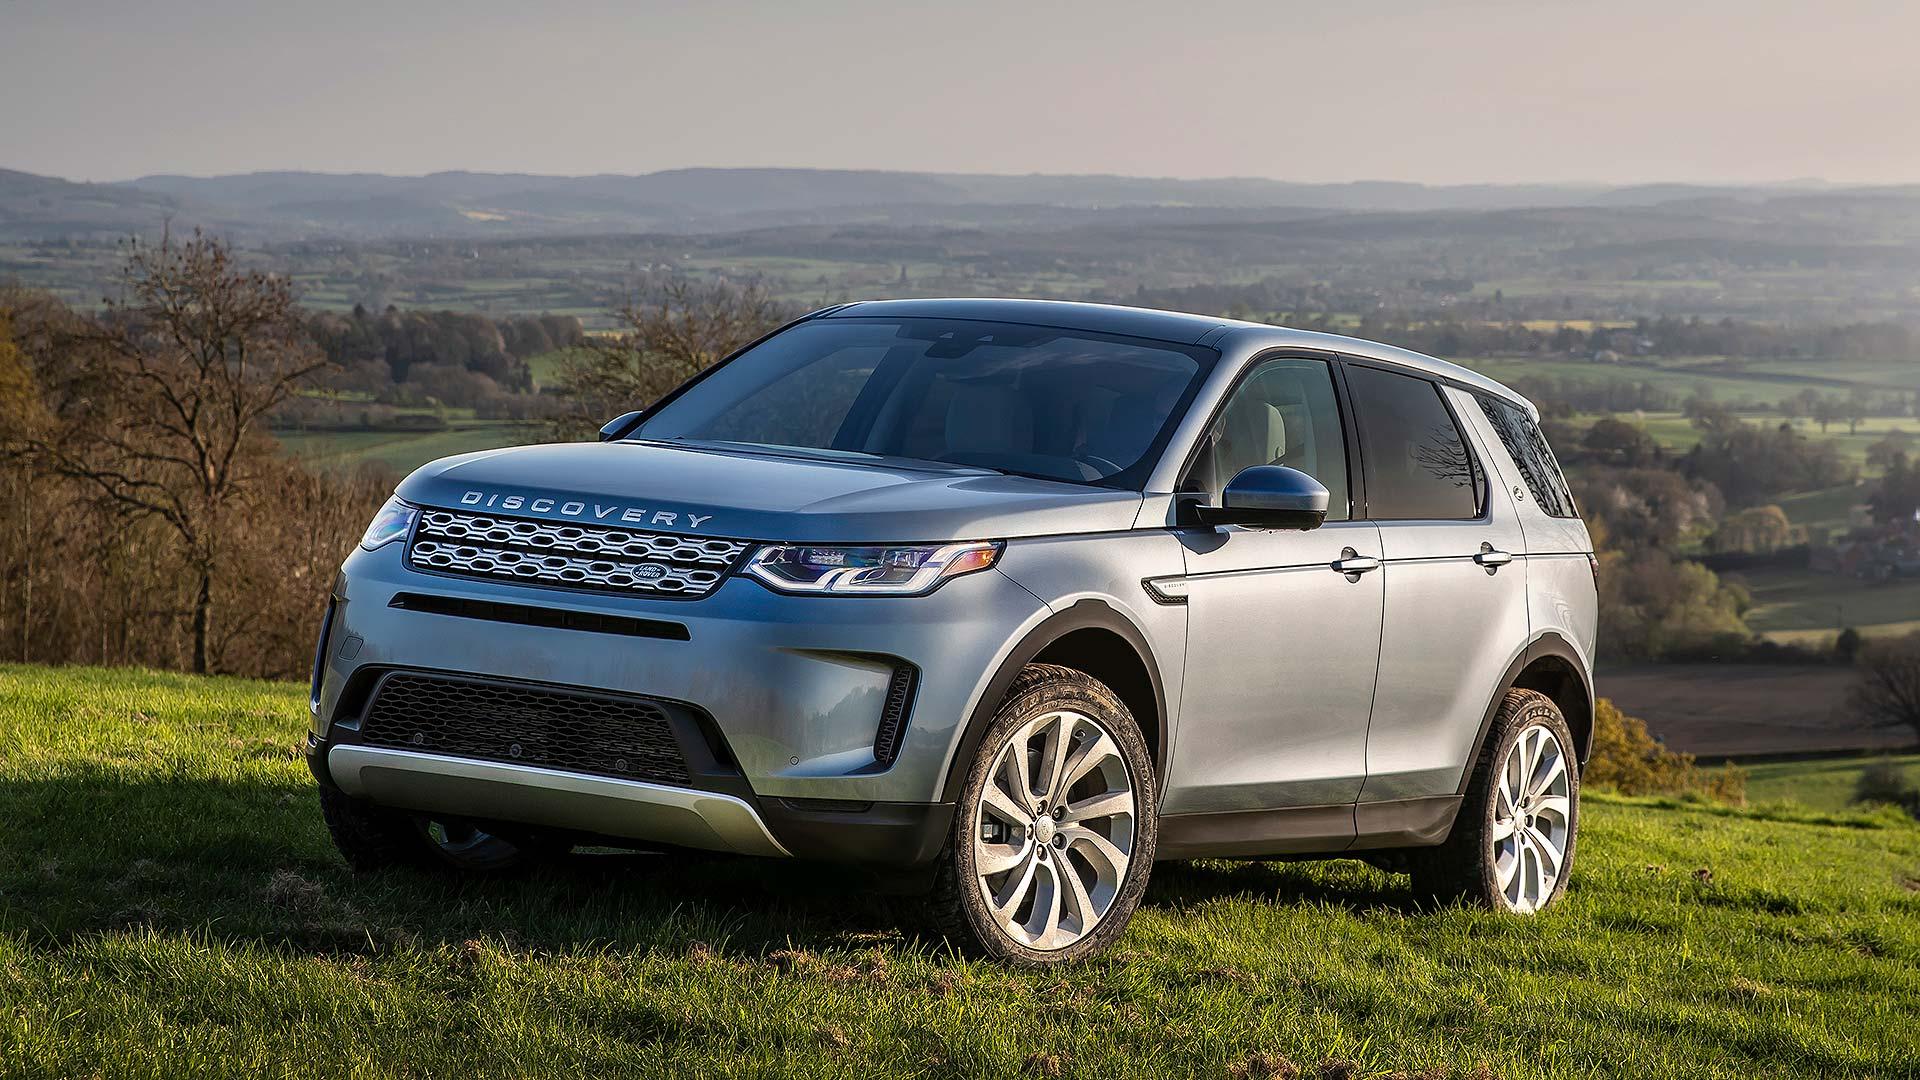 2020 Land Rover Range Rover Sport: Changes, Equipment, Price >> 2020 Land Rover Range Rover Sport Changes Equipment Price